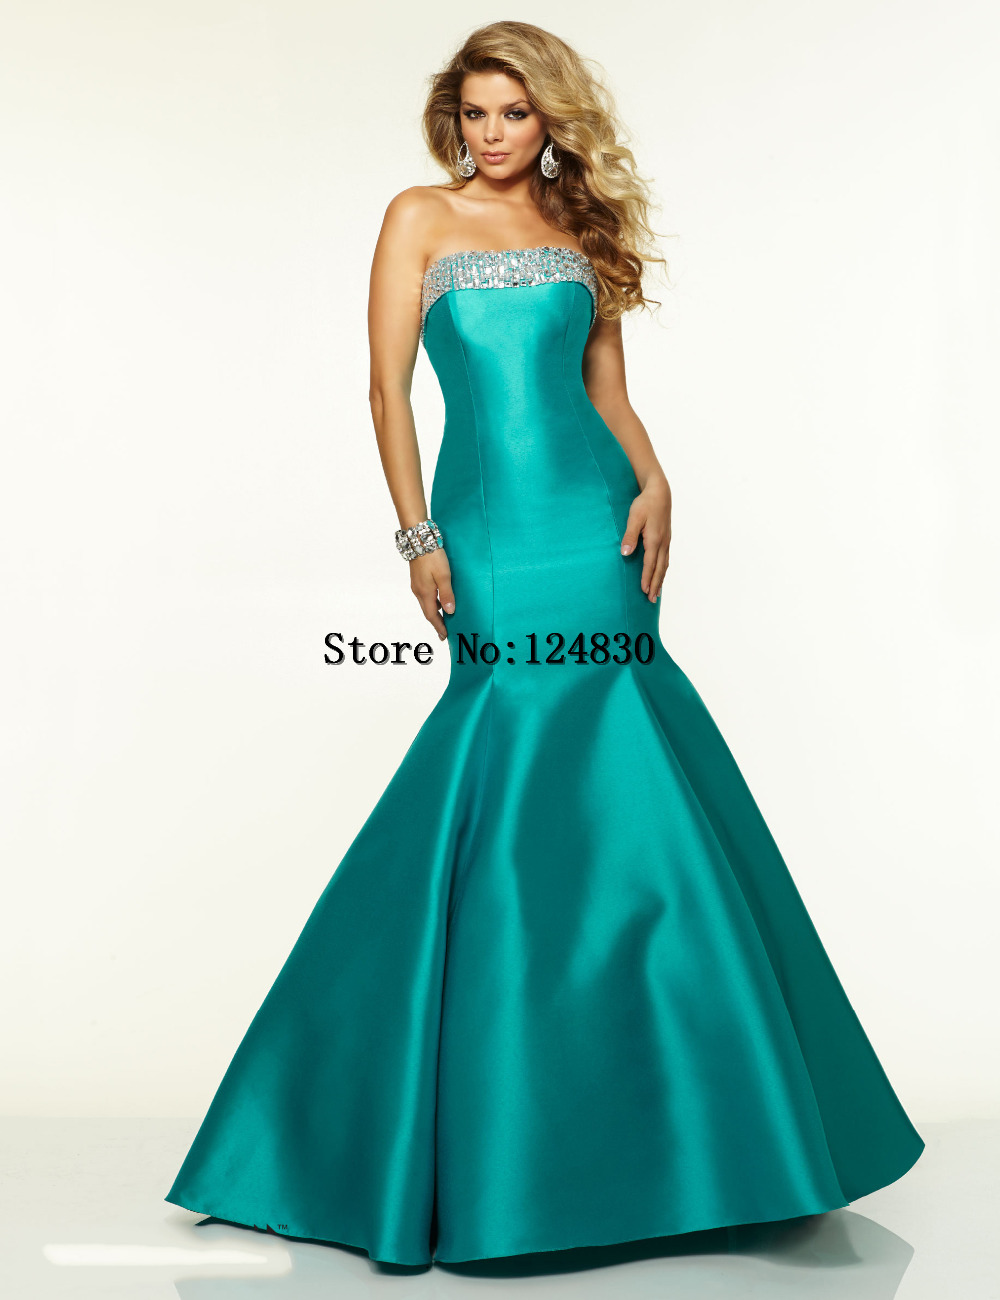 Free Shipping Cheap 2016 Plus Size Mermaid Prom Dresses Floor Length